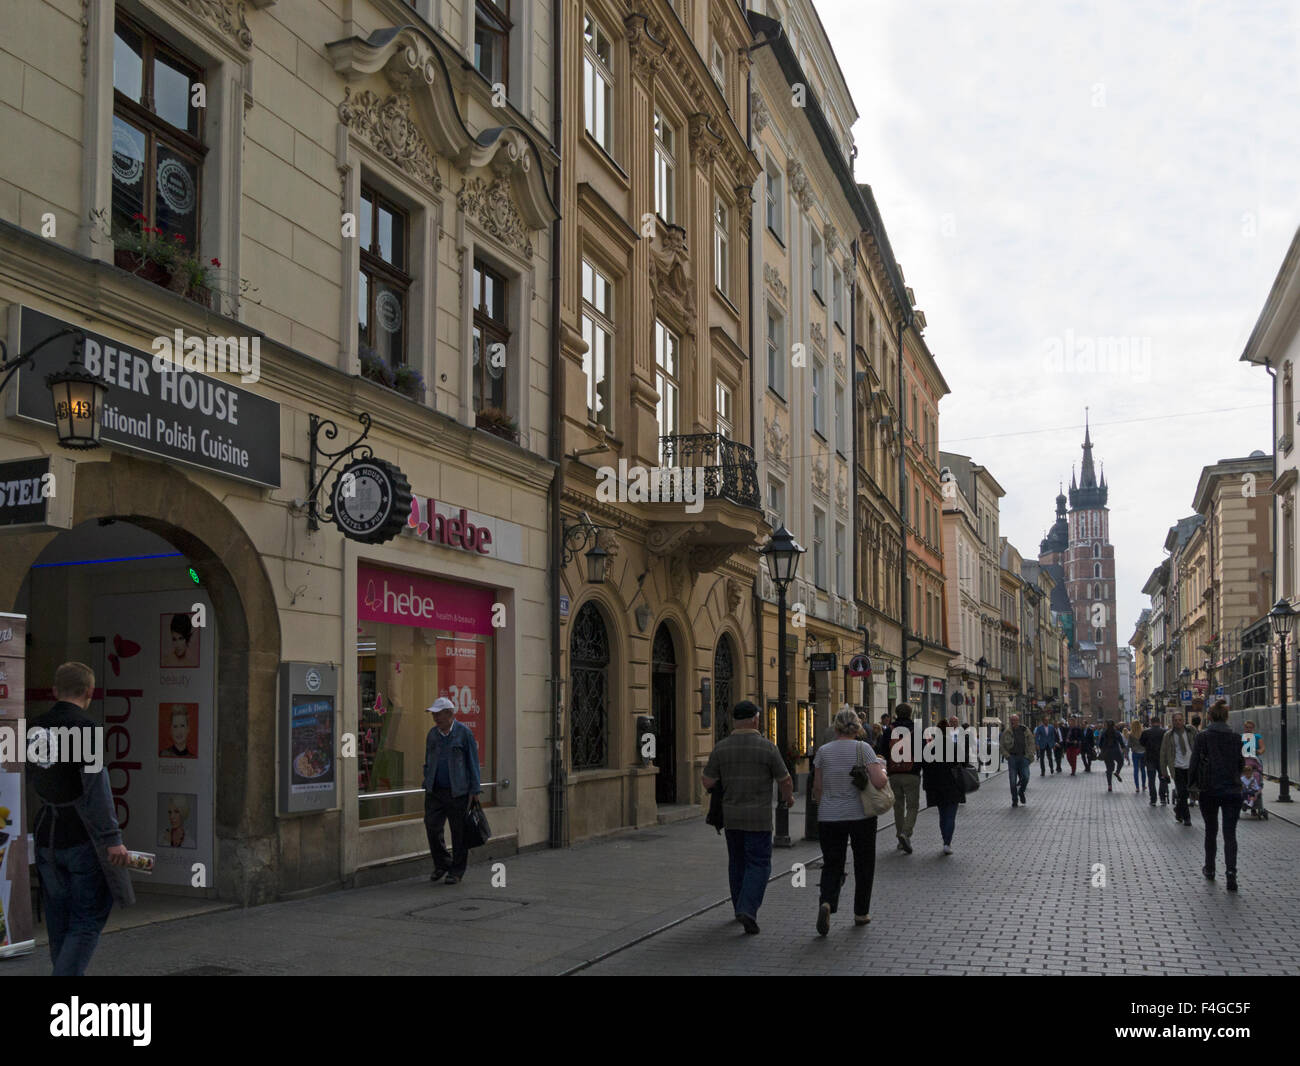 View down busy cobbled Florianska Street Krakow Poland to Bazylika Mariacka St Marys Basilica 14thc brick Gothic - Stock Image